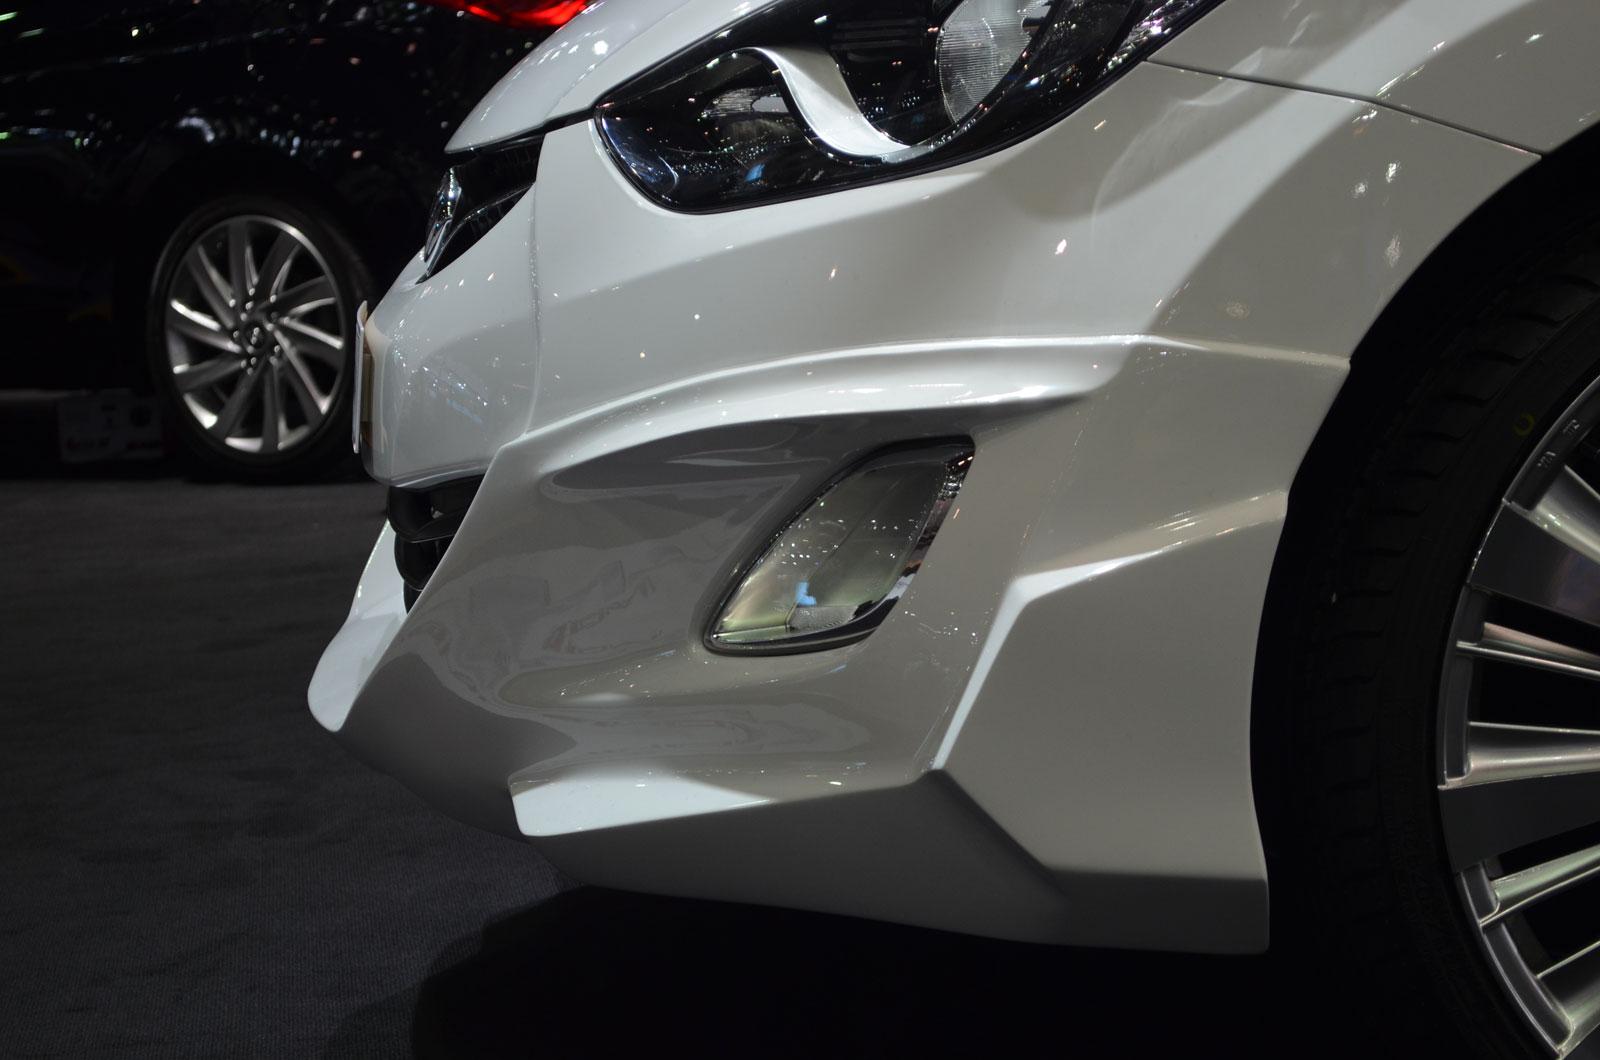 Hyundai elantra i40 avante bodykit sports modified